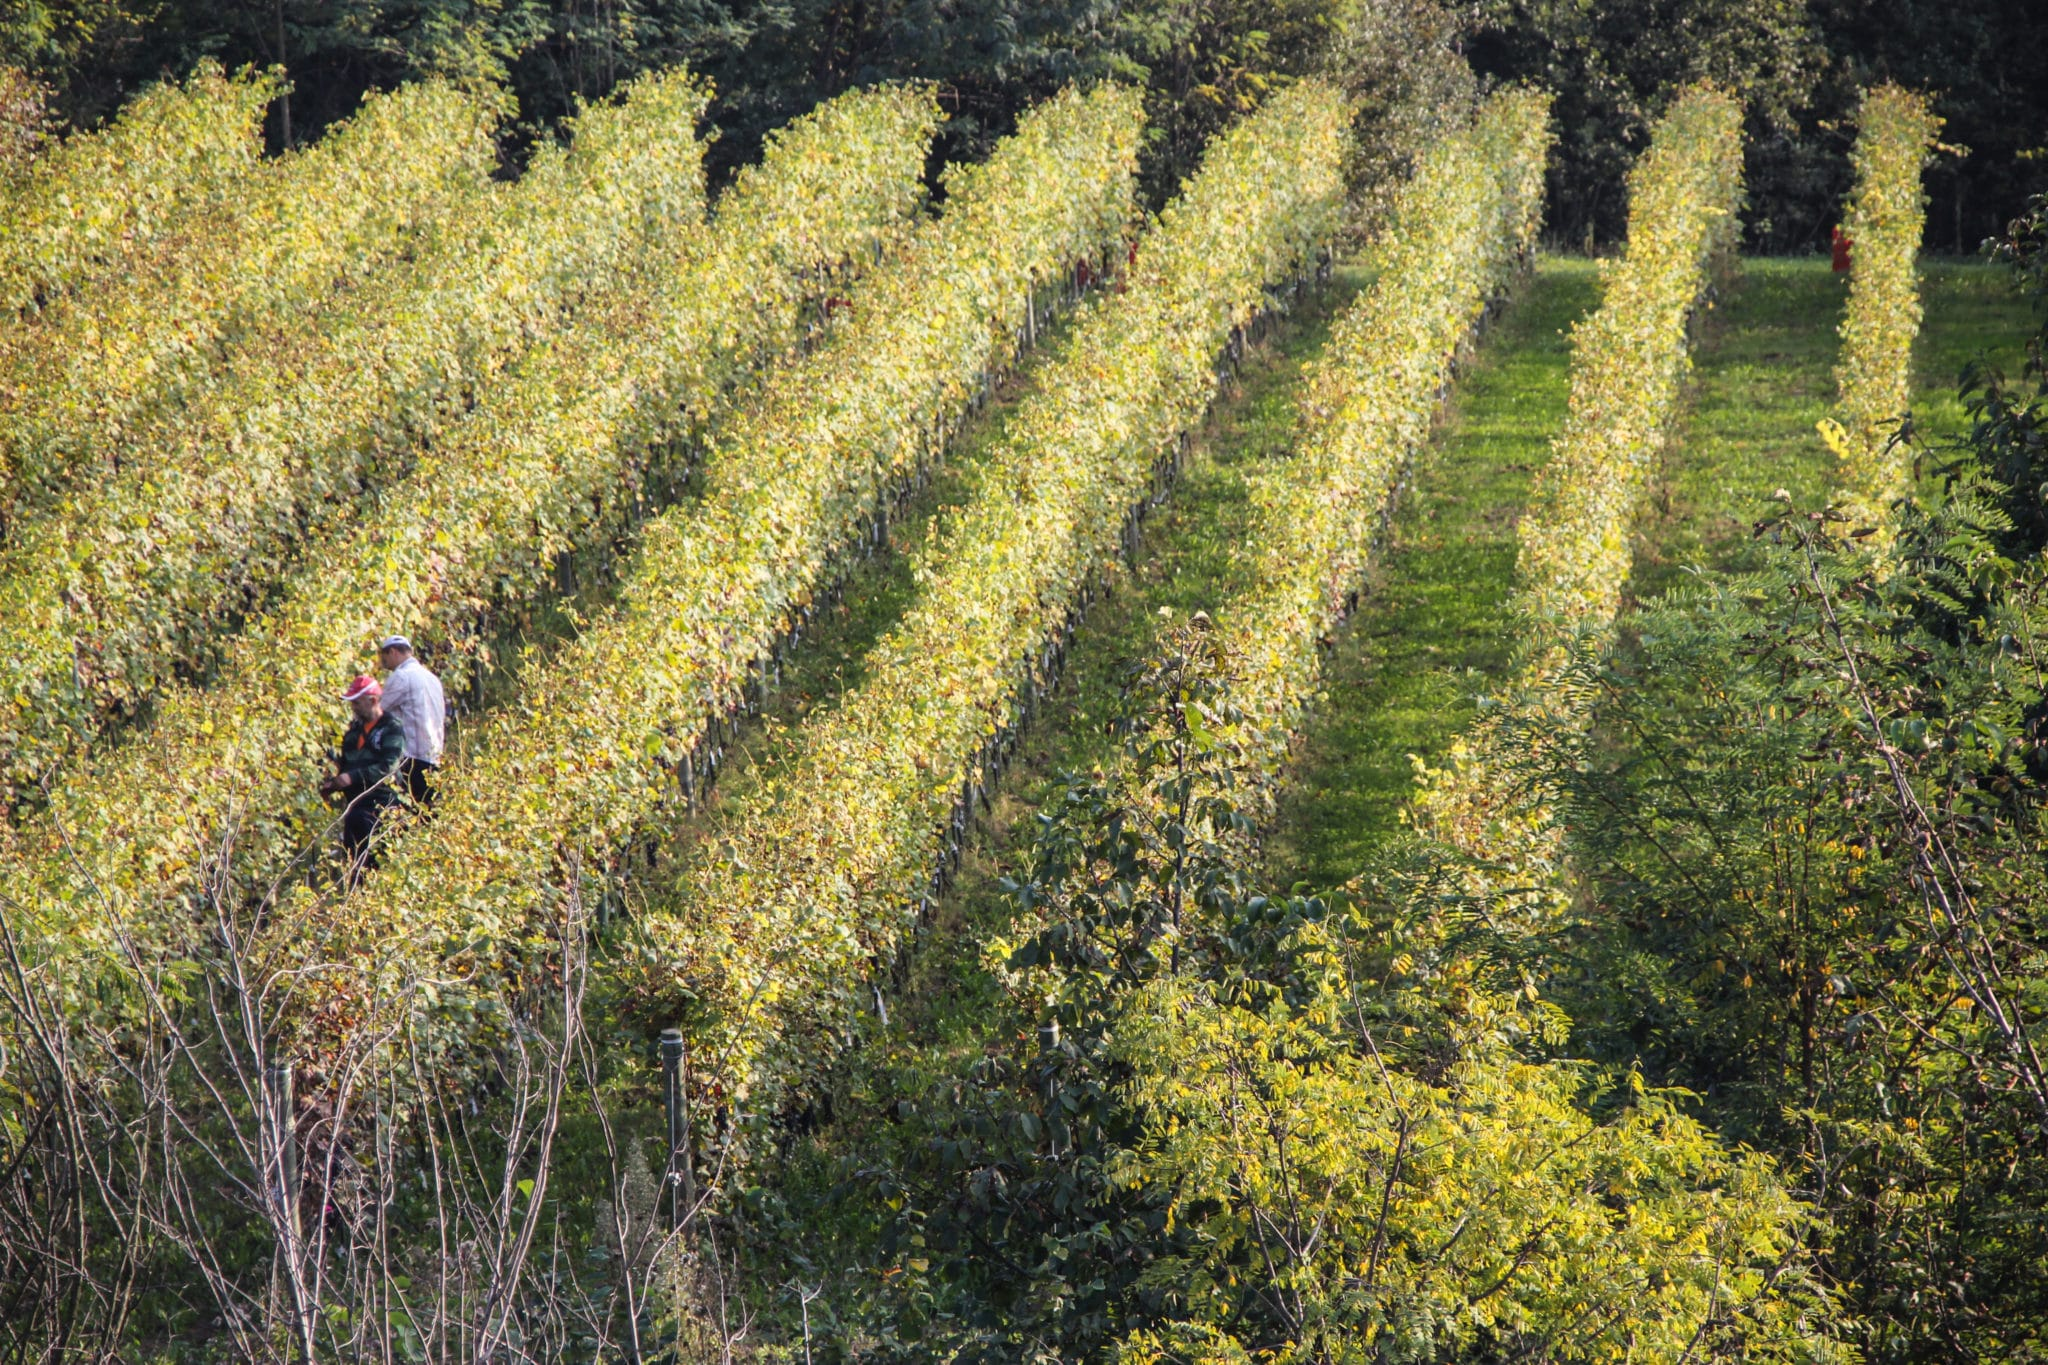 Serradenari_vineyards_Barrolo